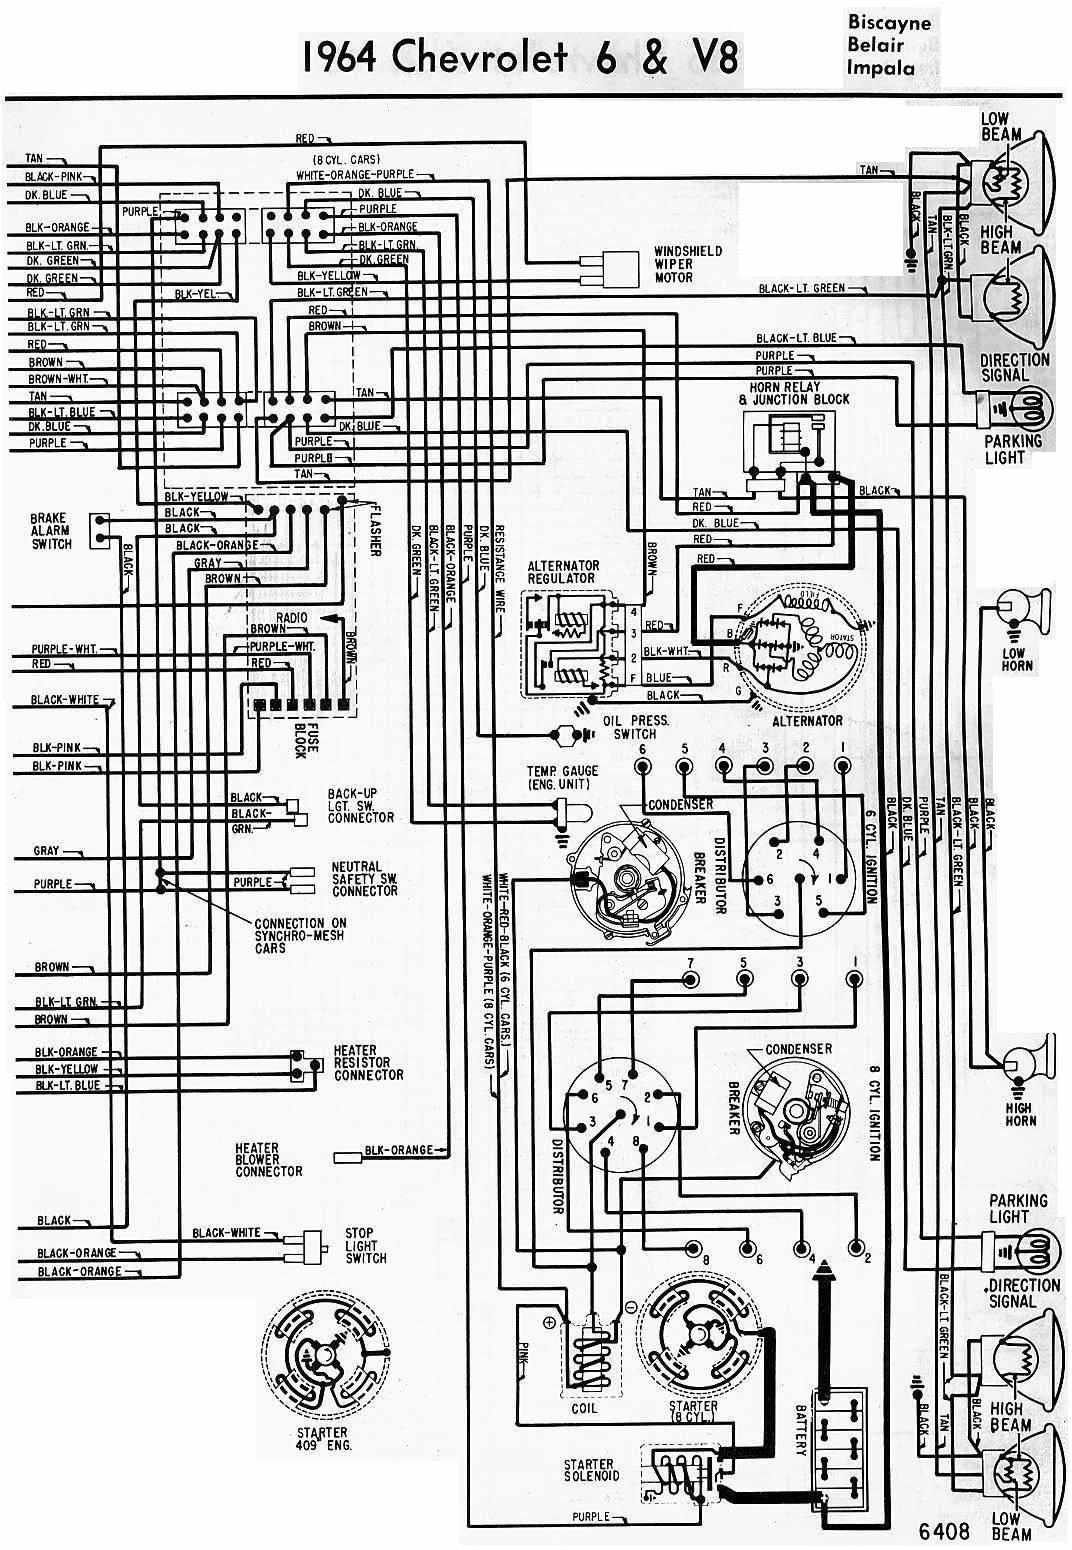 Sr20de Wiring Harness 21 Diagram Images Diagrams S14 Sr20det Electrical Of 1964 Chevrolet 6 And